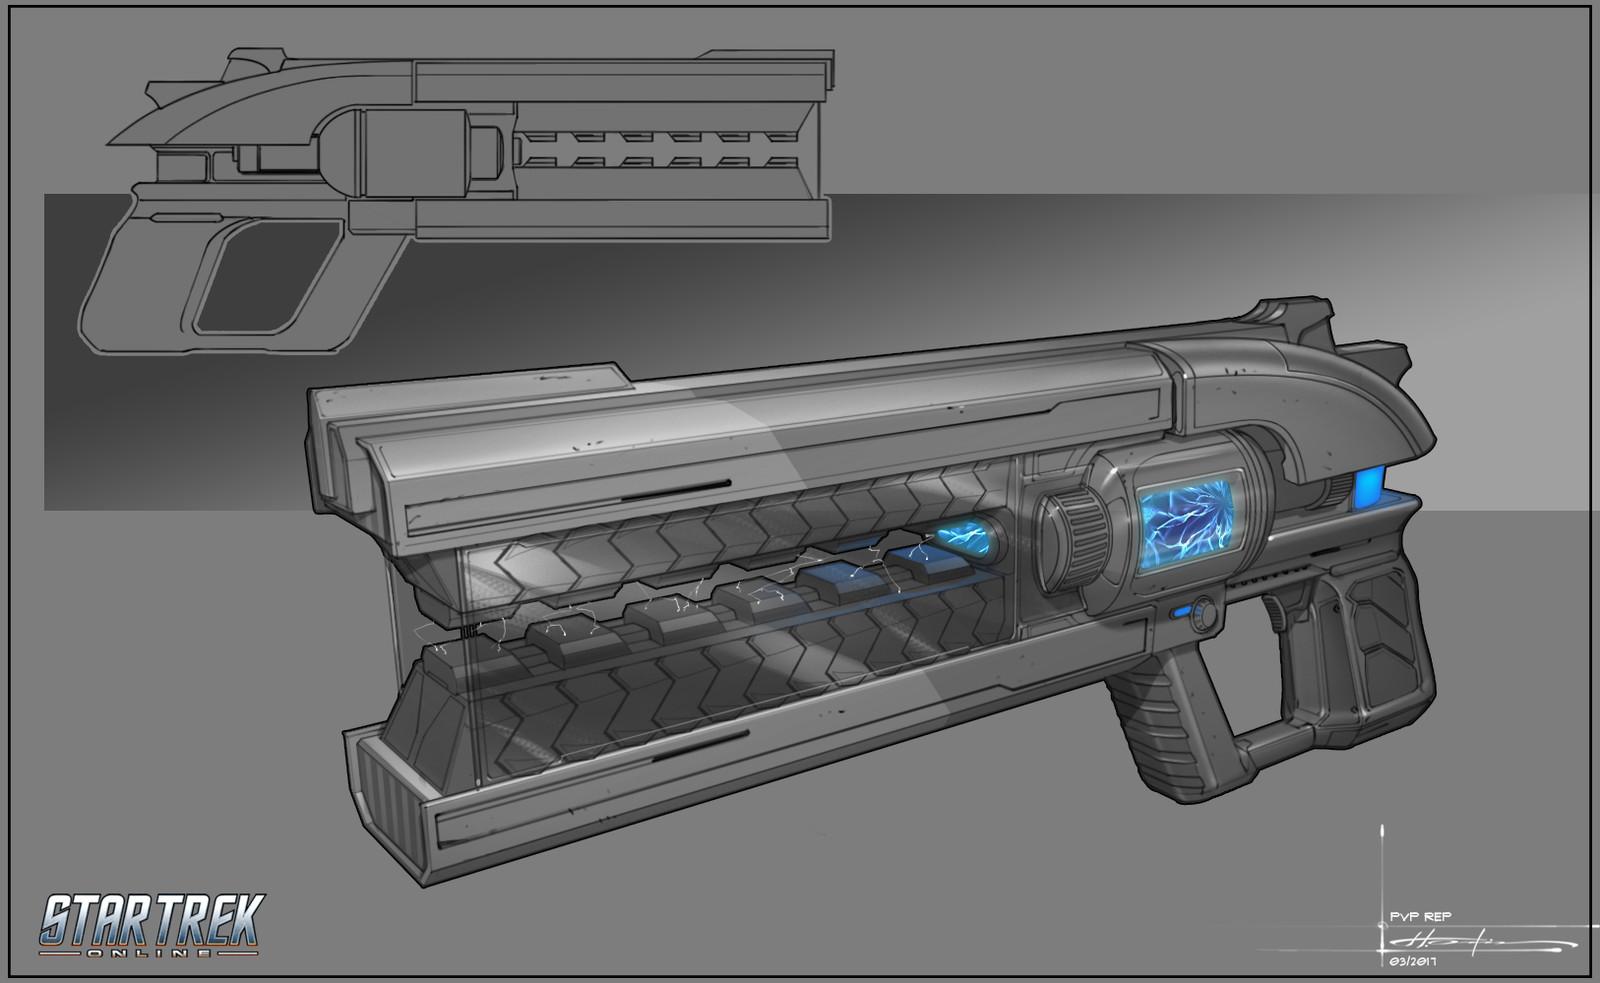 Duelist Tetryon Decompression Pistol Mk XII